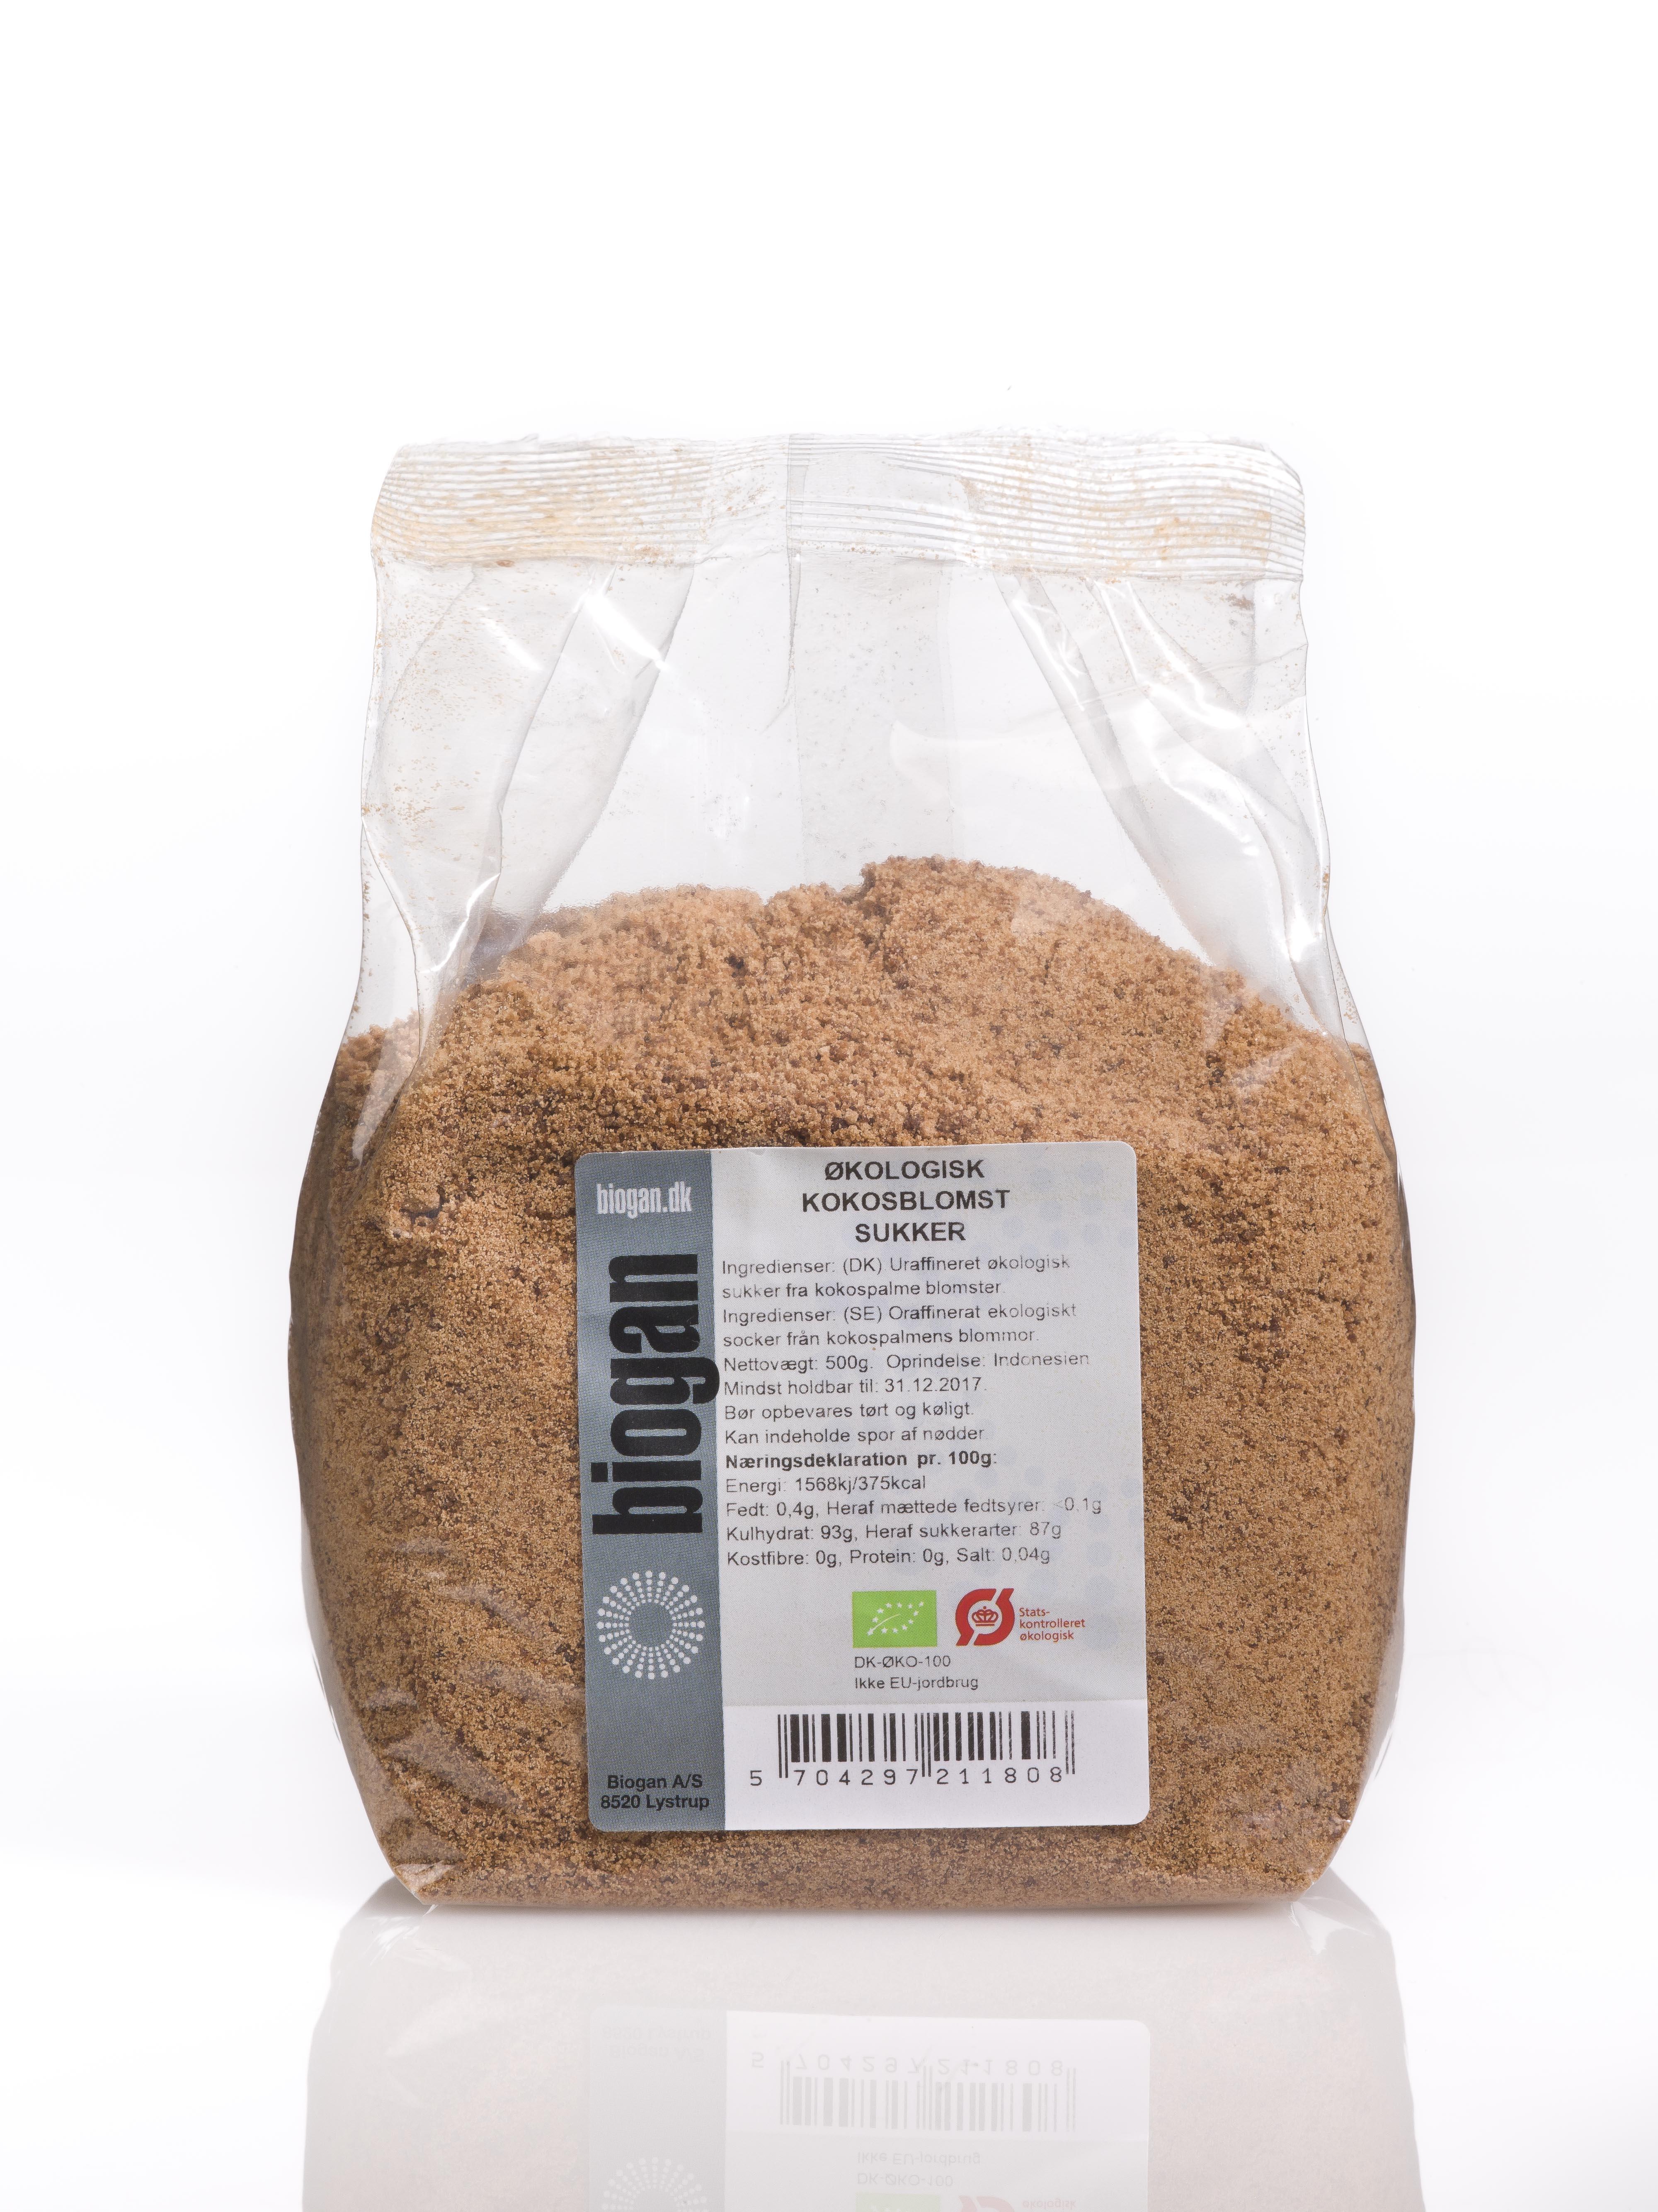 Biogan kokossukker fra Mecindo